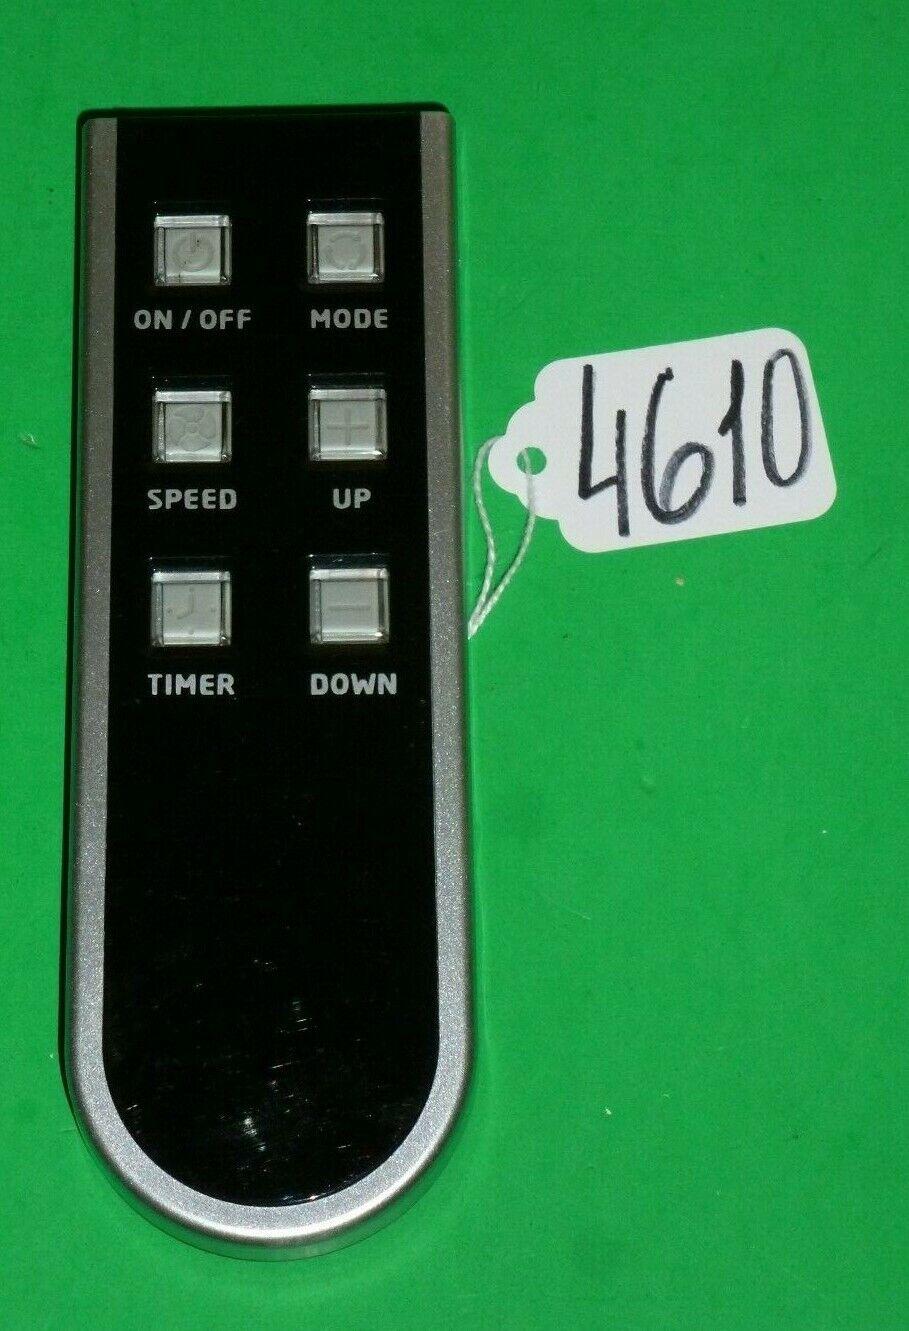 Original Air Conditioner Remote Control For HAIER CPN14XC9 AC A/C  - $14.99